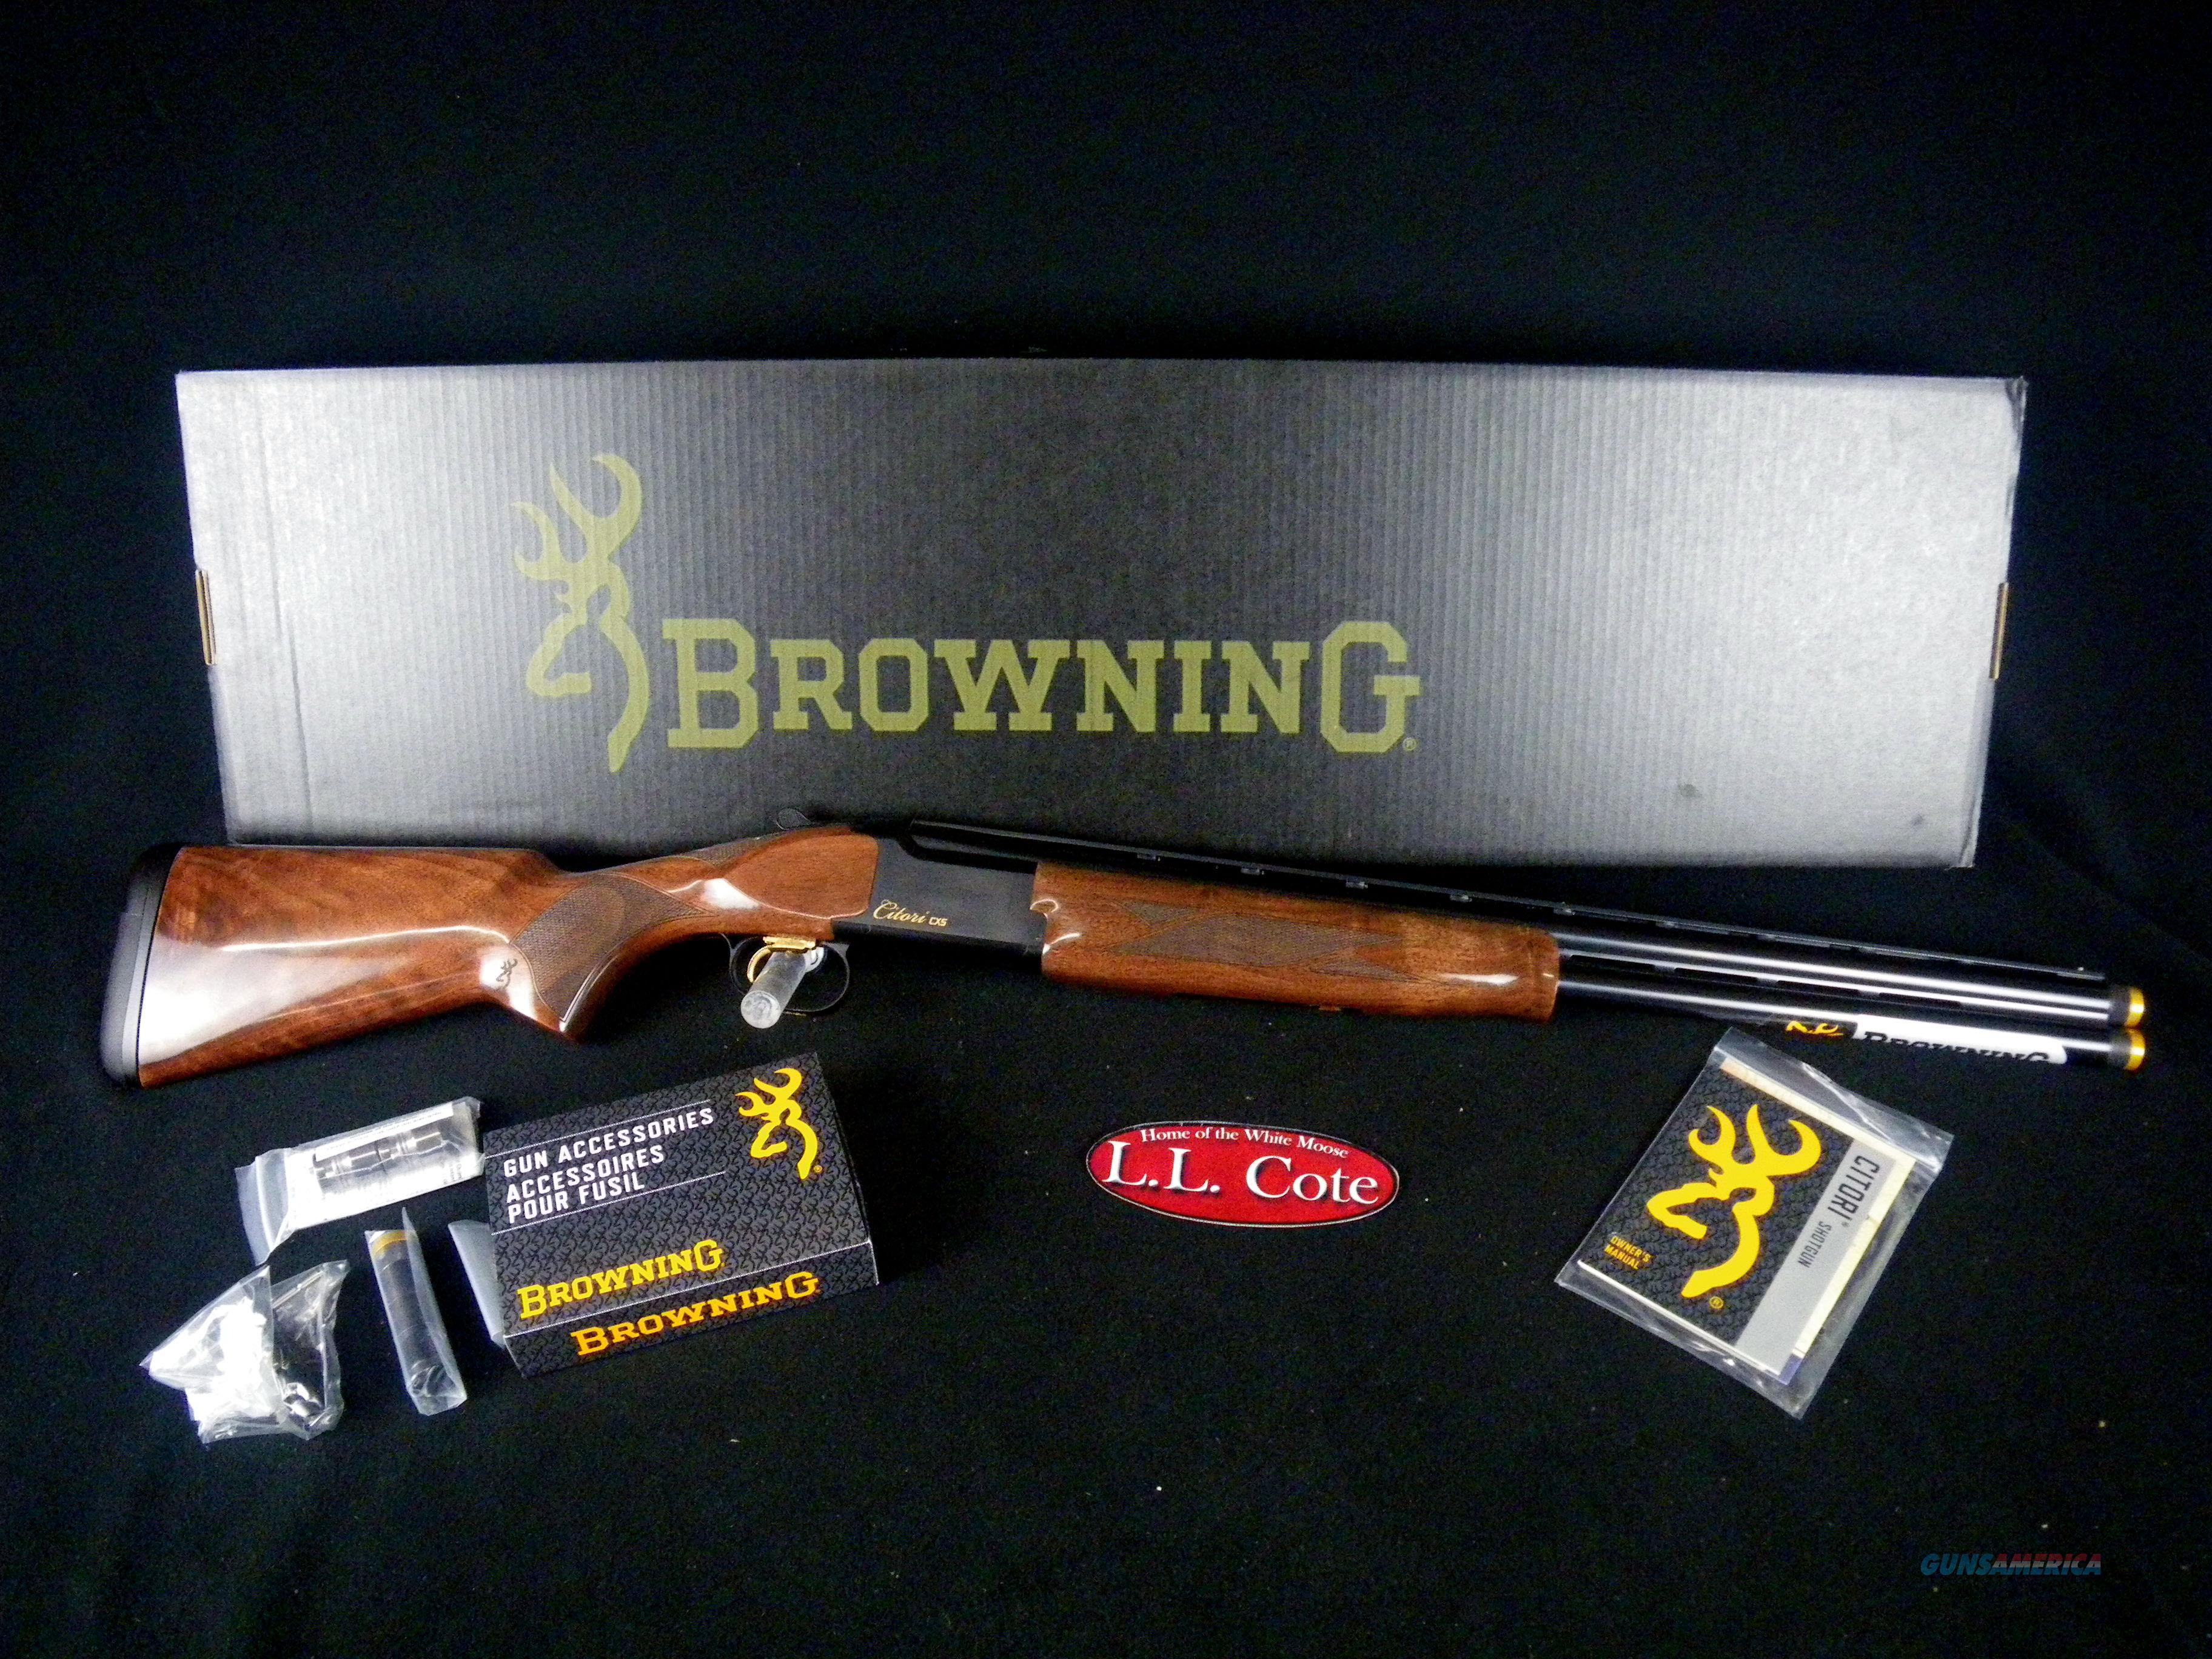 "Browning Citori CXS Micro 12ga 26"" NEW 3"" 018140305  Guns > Shotguns > Browning Shotguns > Over Unders > Citori > Hunting"